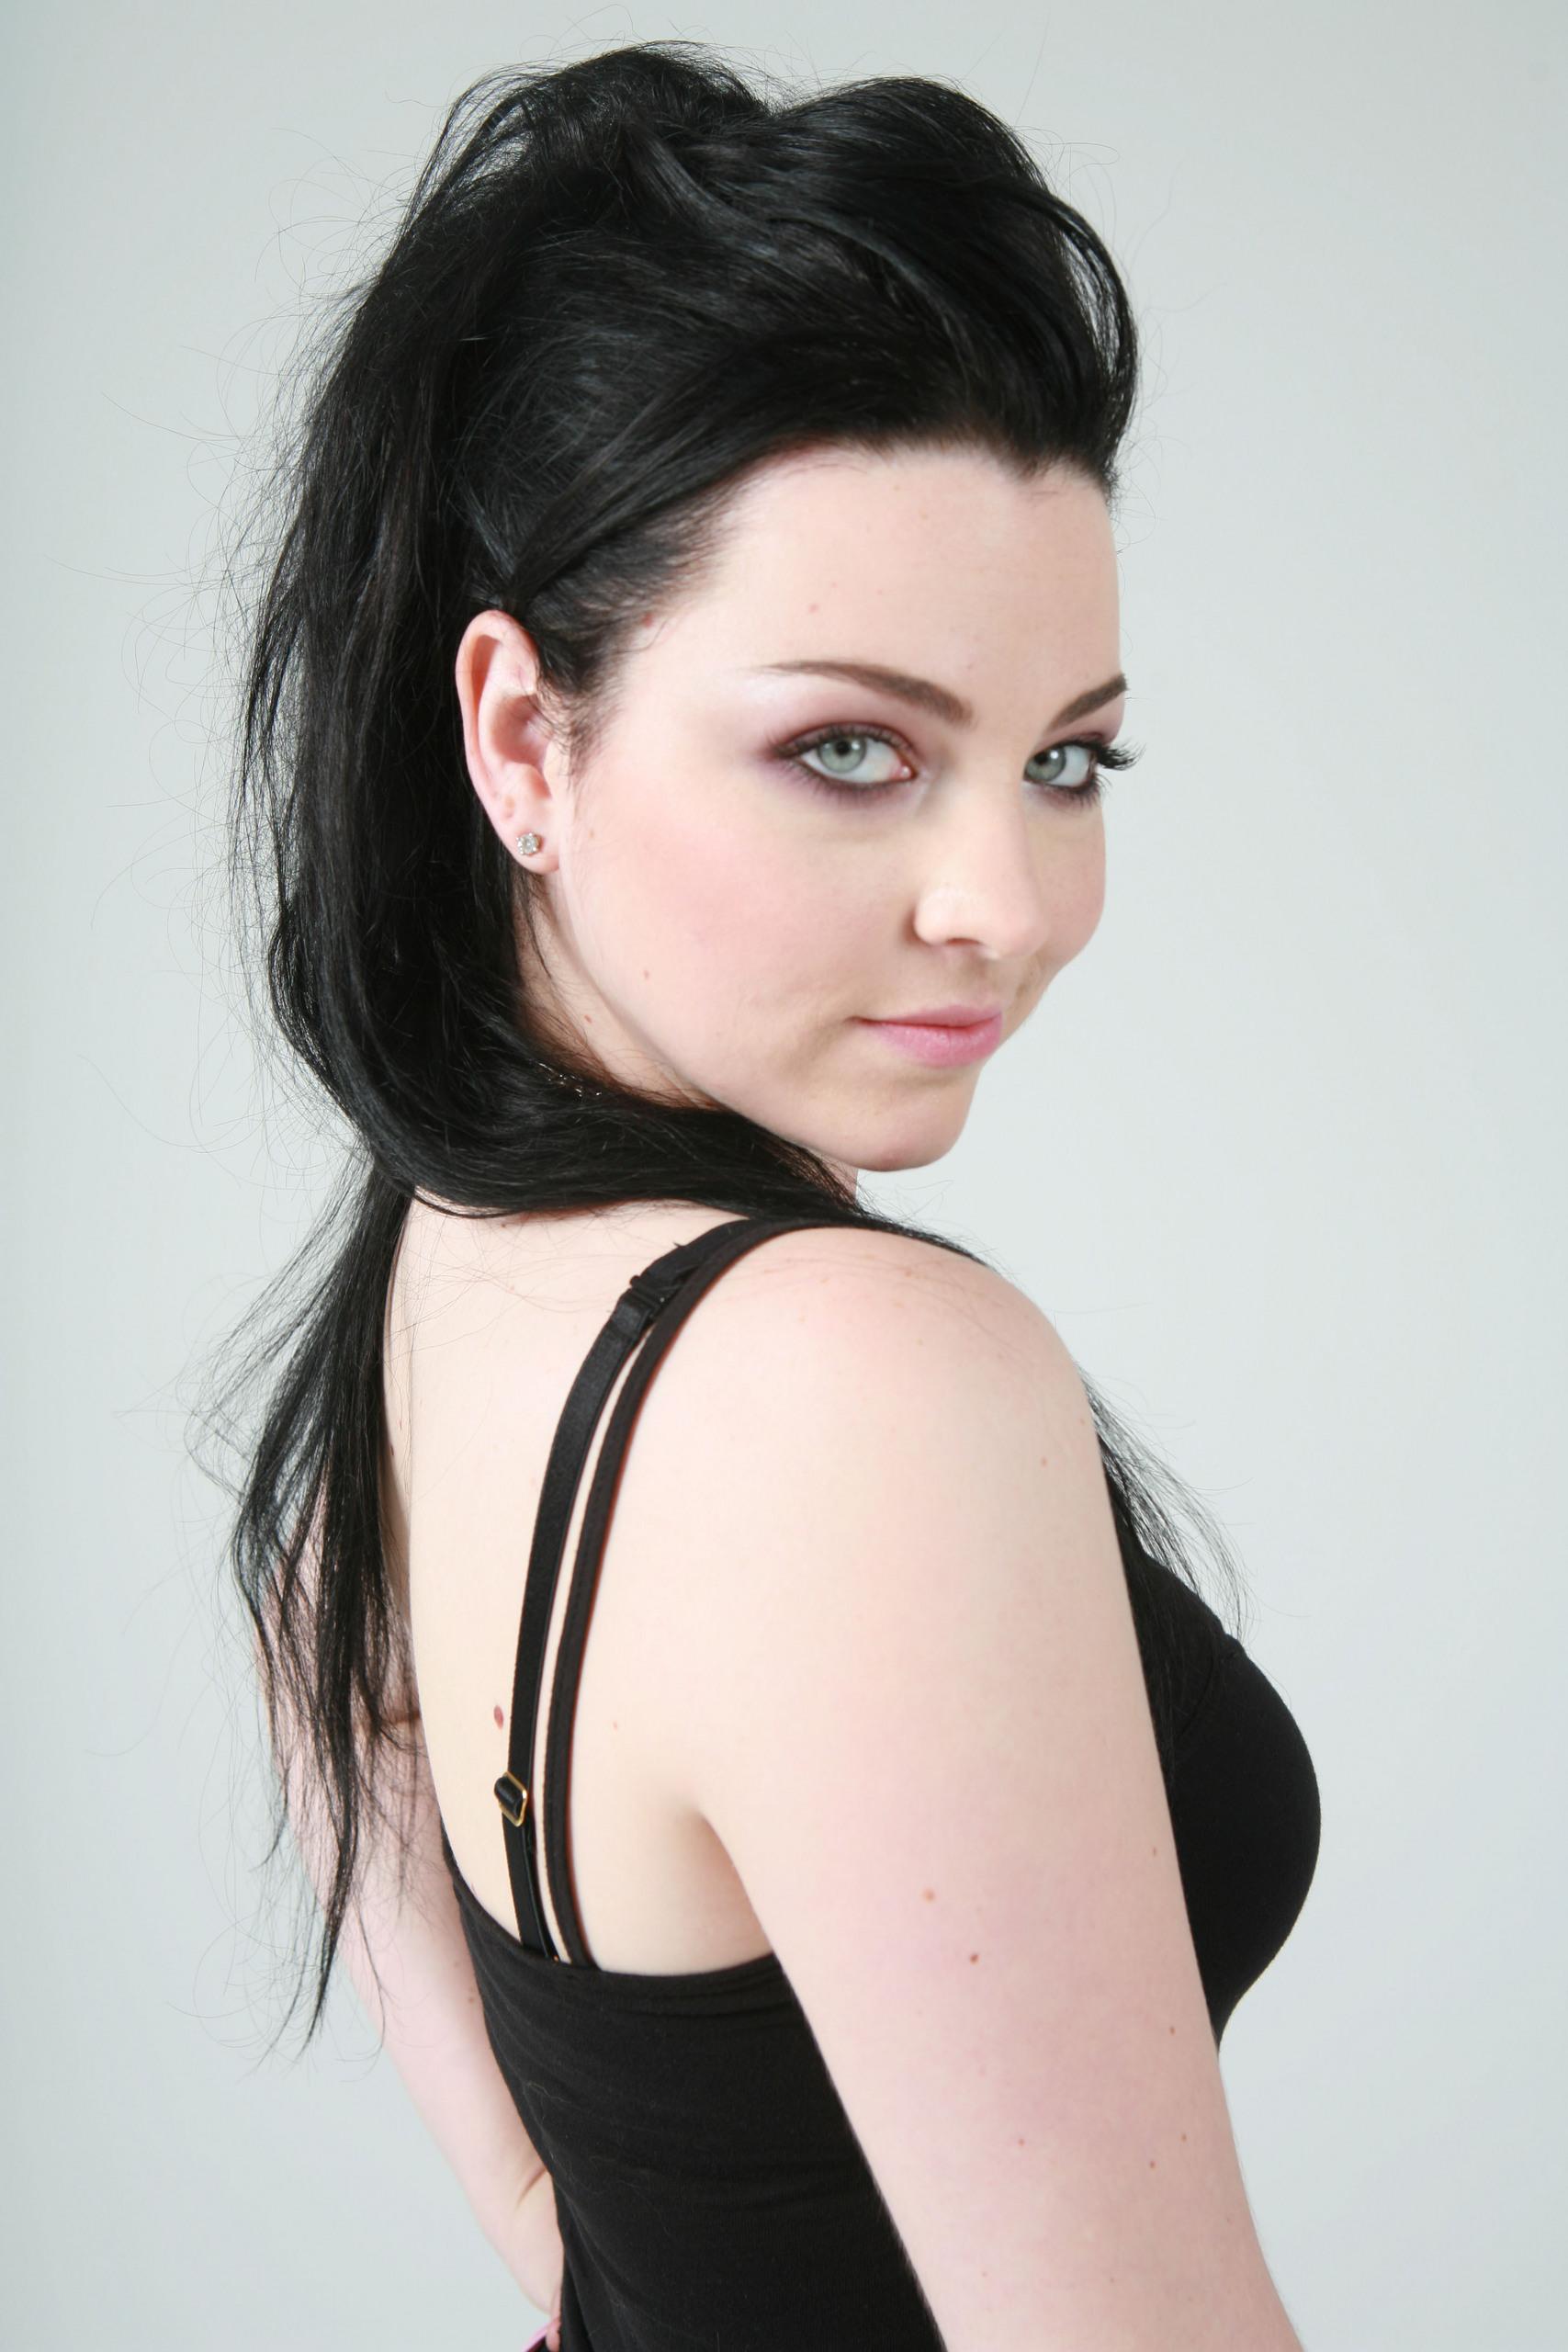 Amy Lee Net Worth